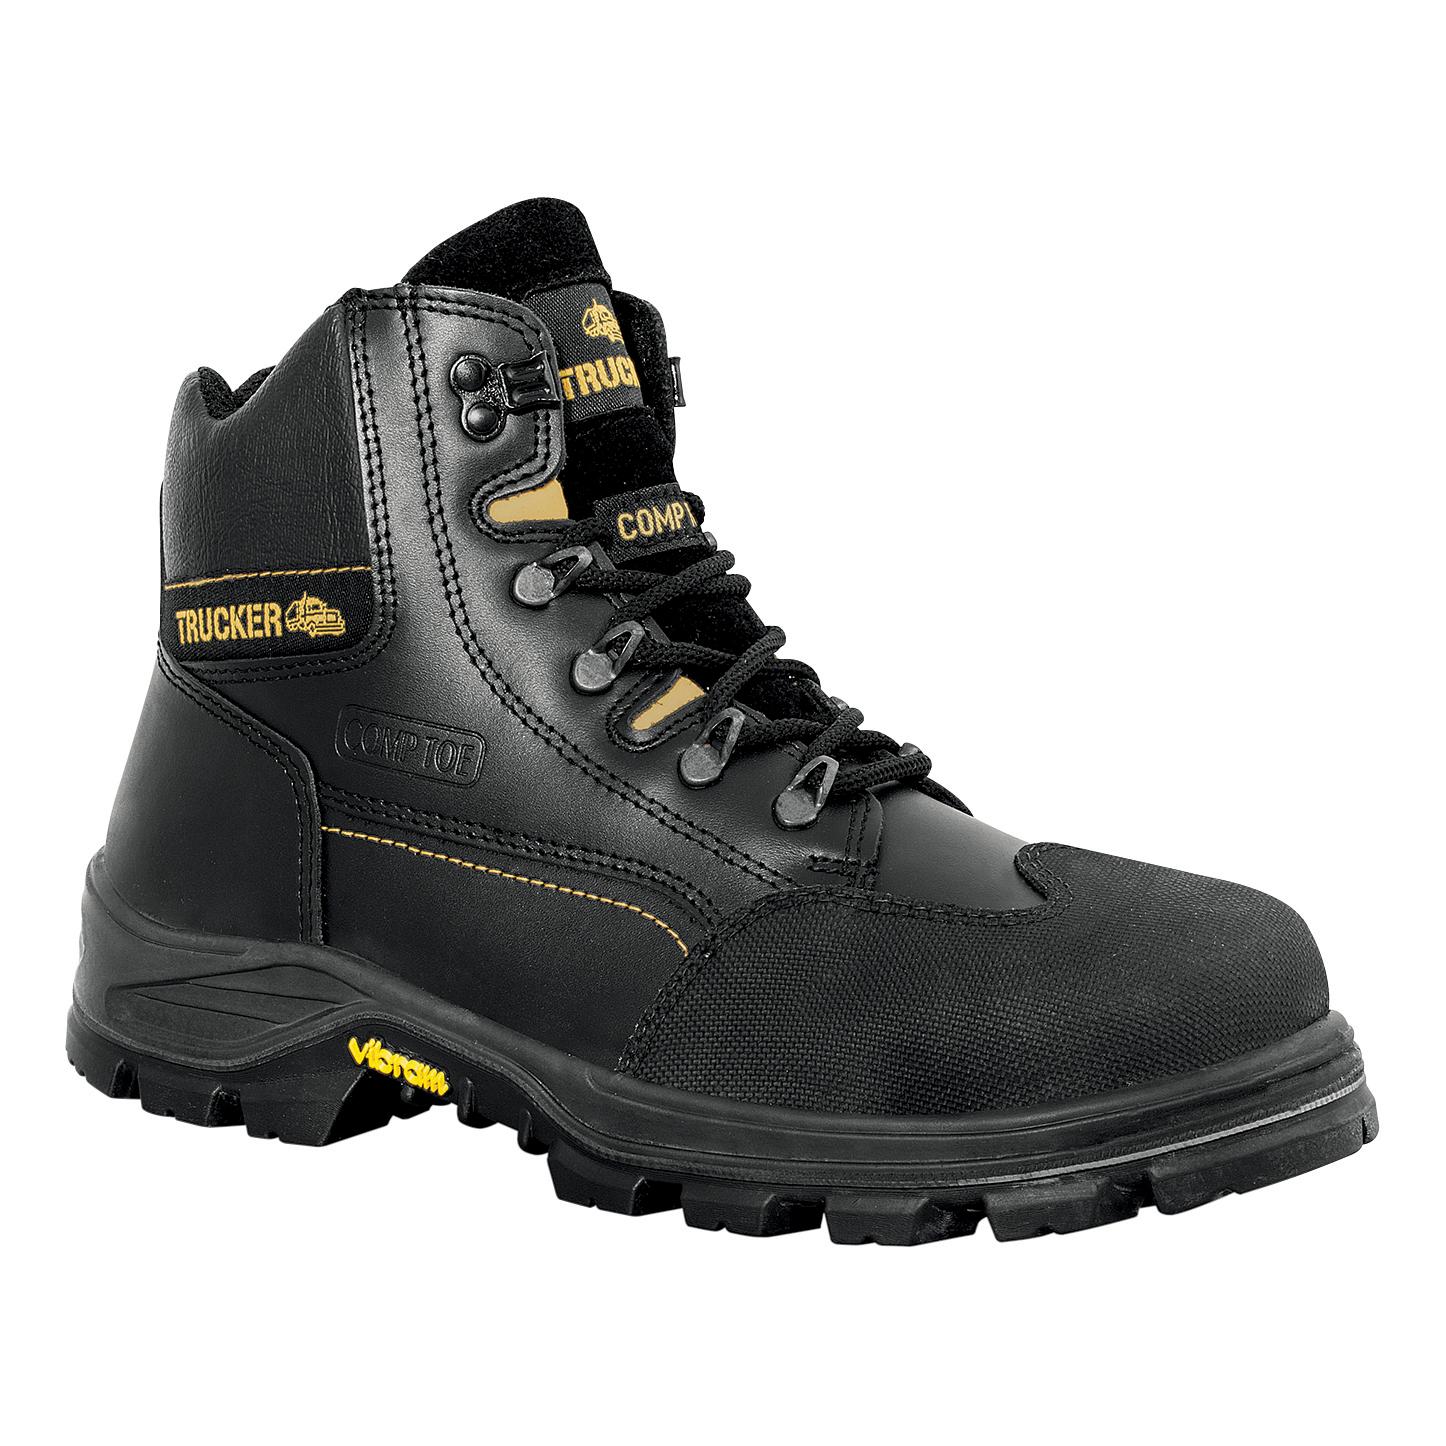 Aimont Revenger Safety Boots Protective Toecap Size 12 Black Ref 7TR0612 Pair